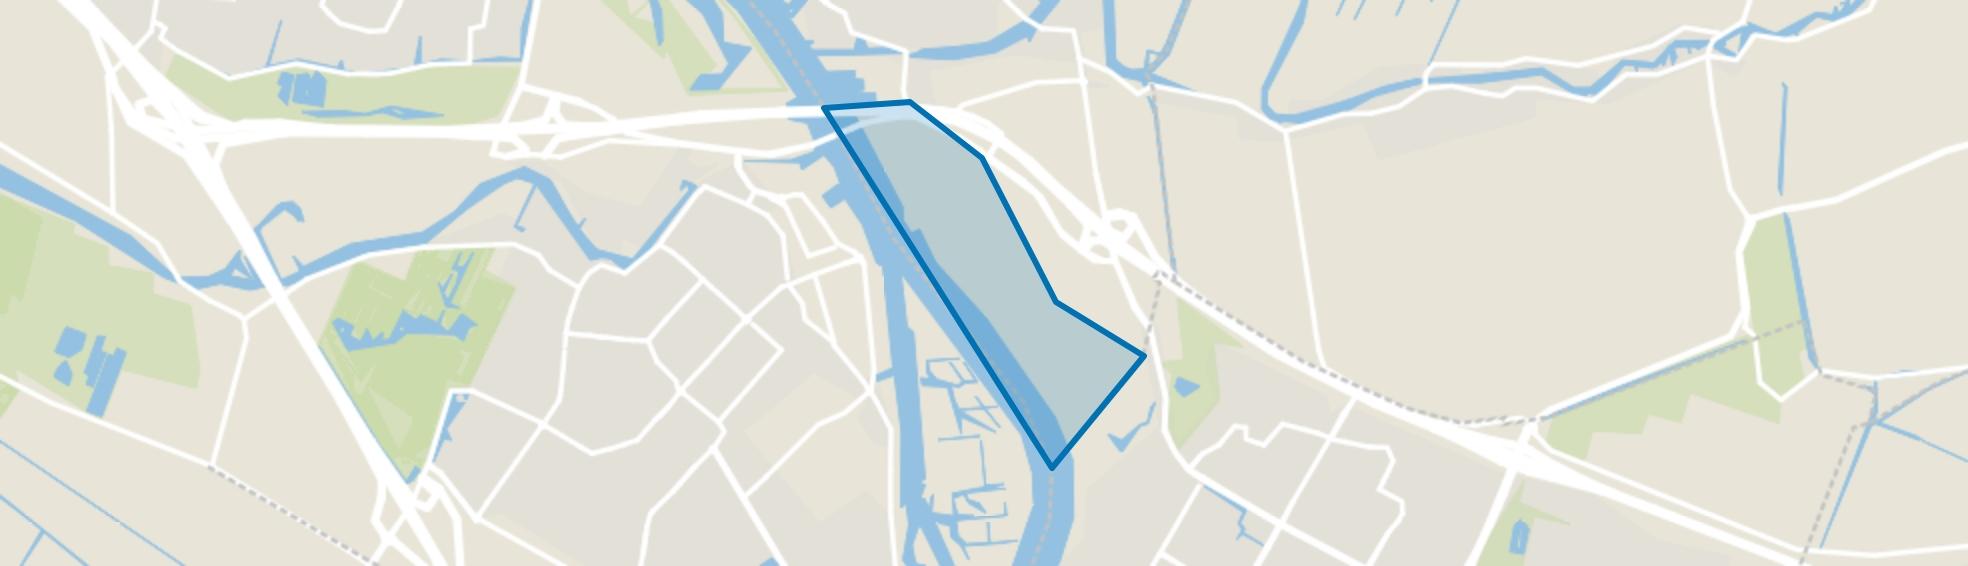 Nieuwland, Alblasserdam map